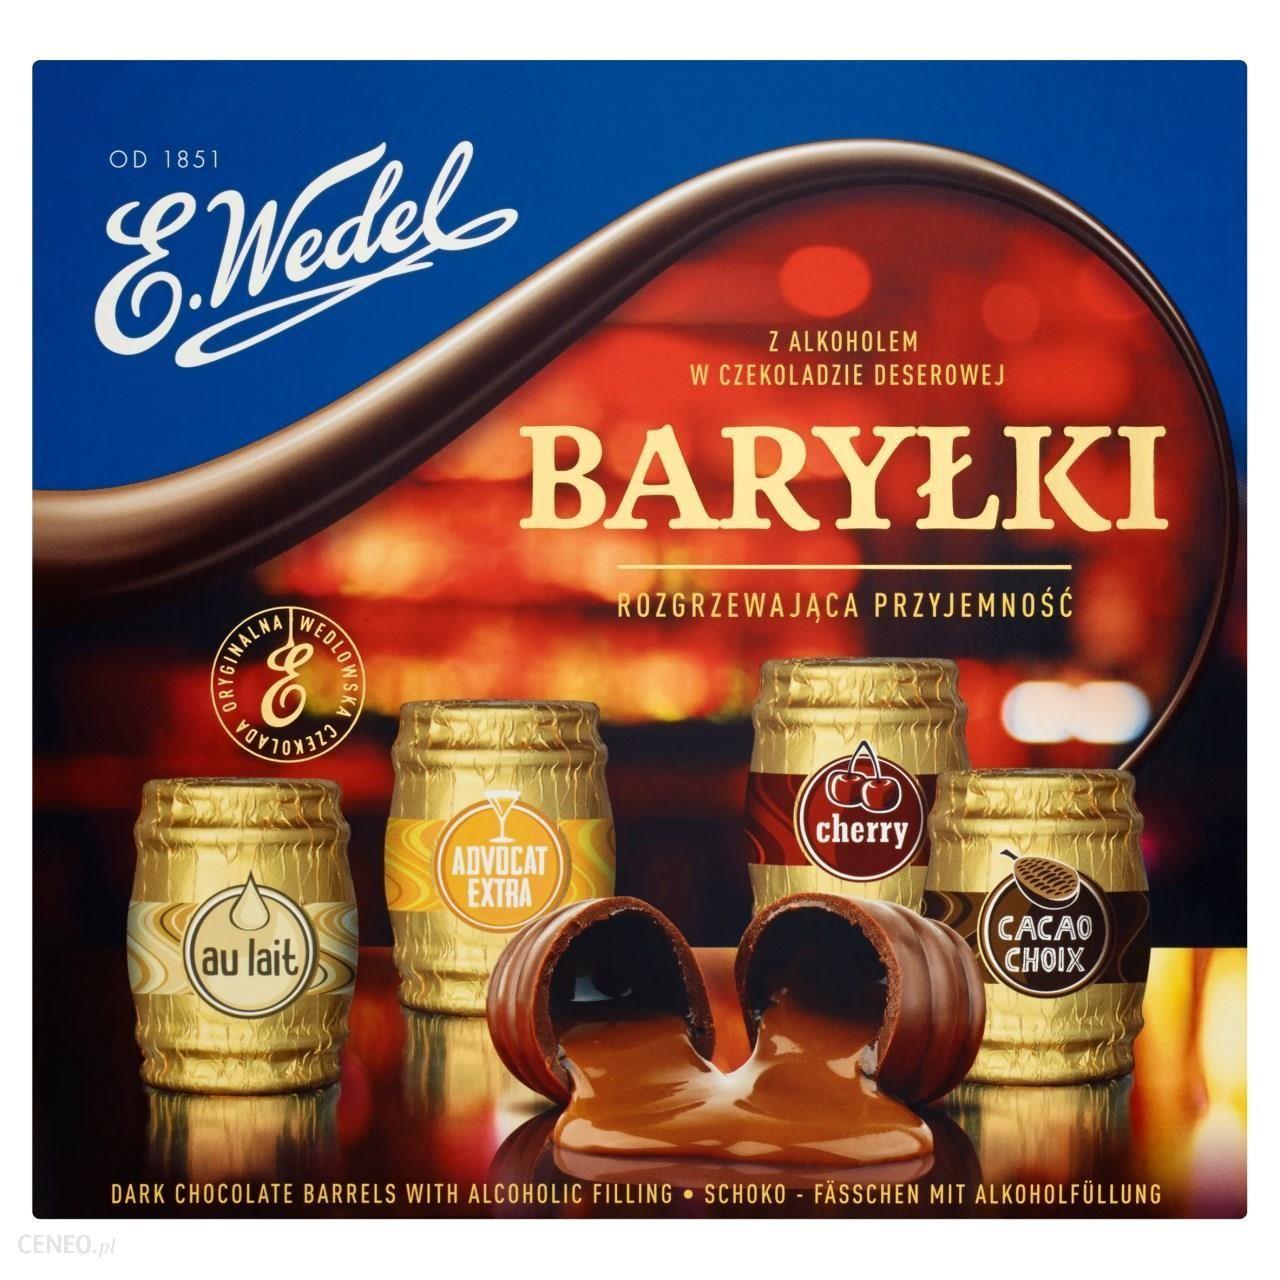 Baryłki Wedel 200g 1+1 Gratis Biedronka. Cena za sztukę 7,50